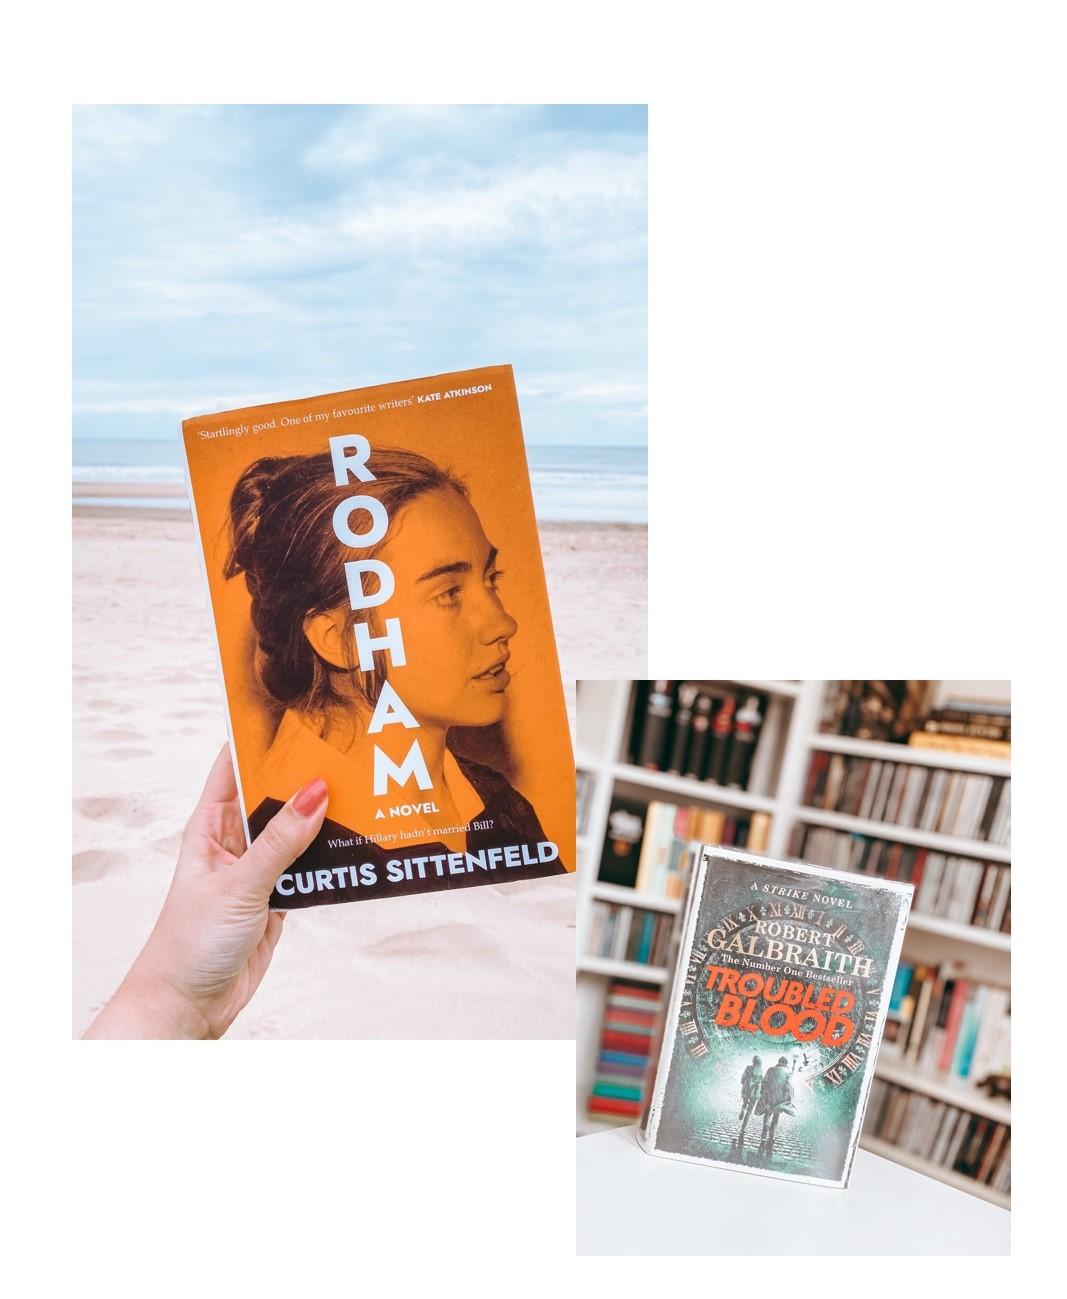 Books I Read In Autumn